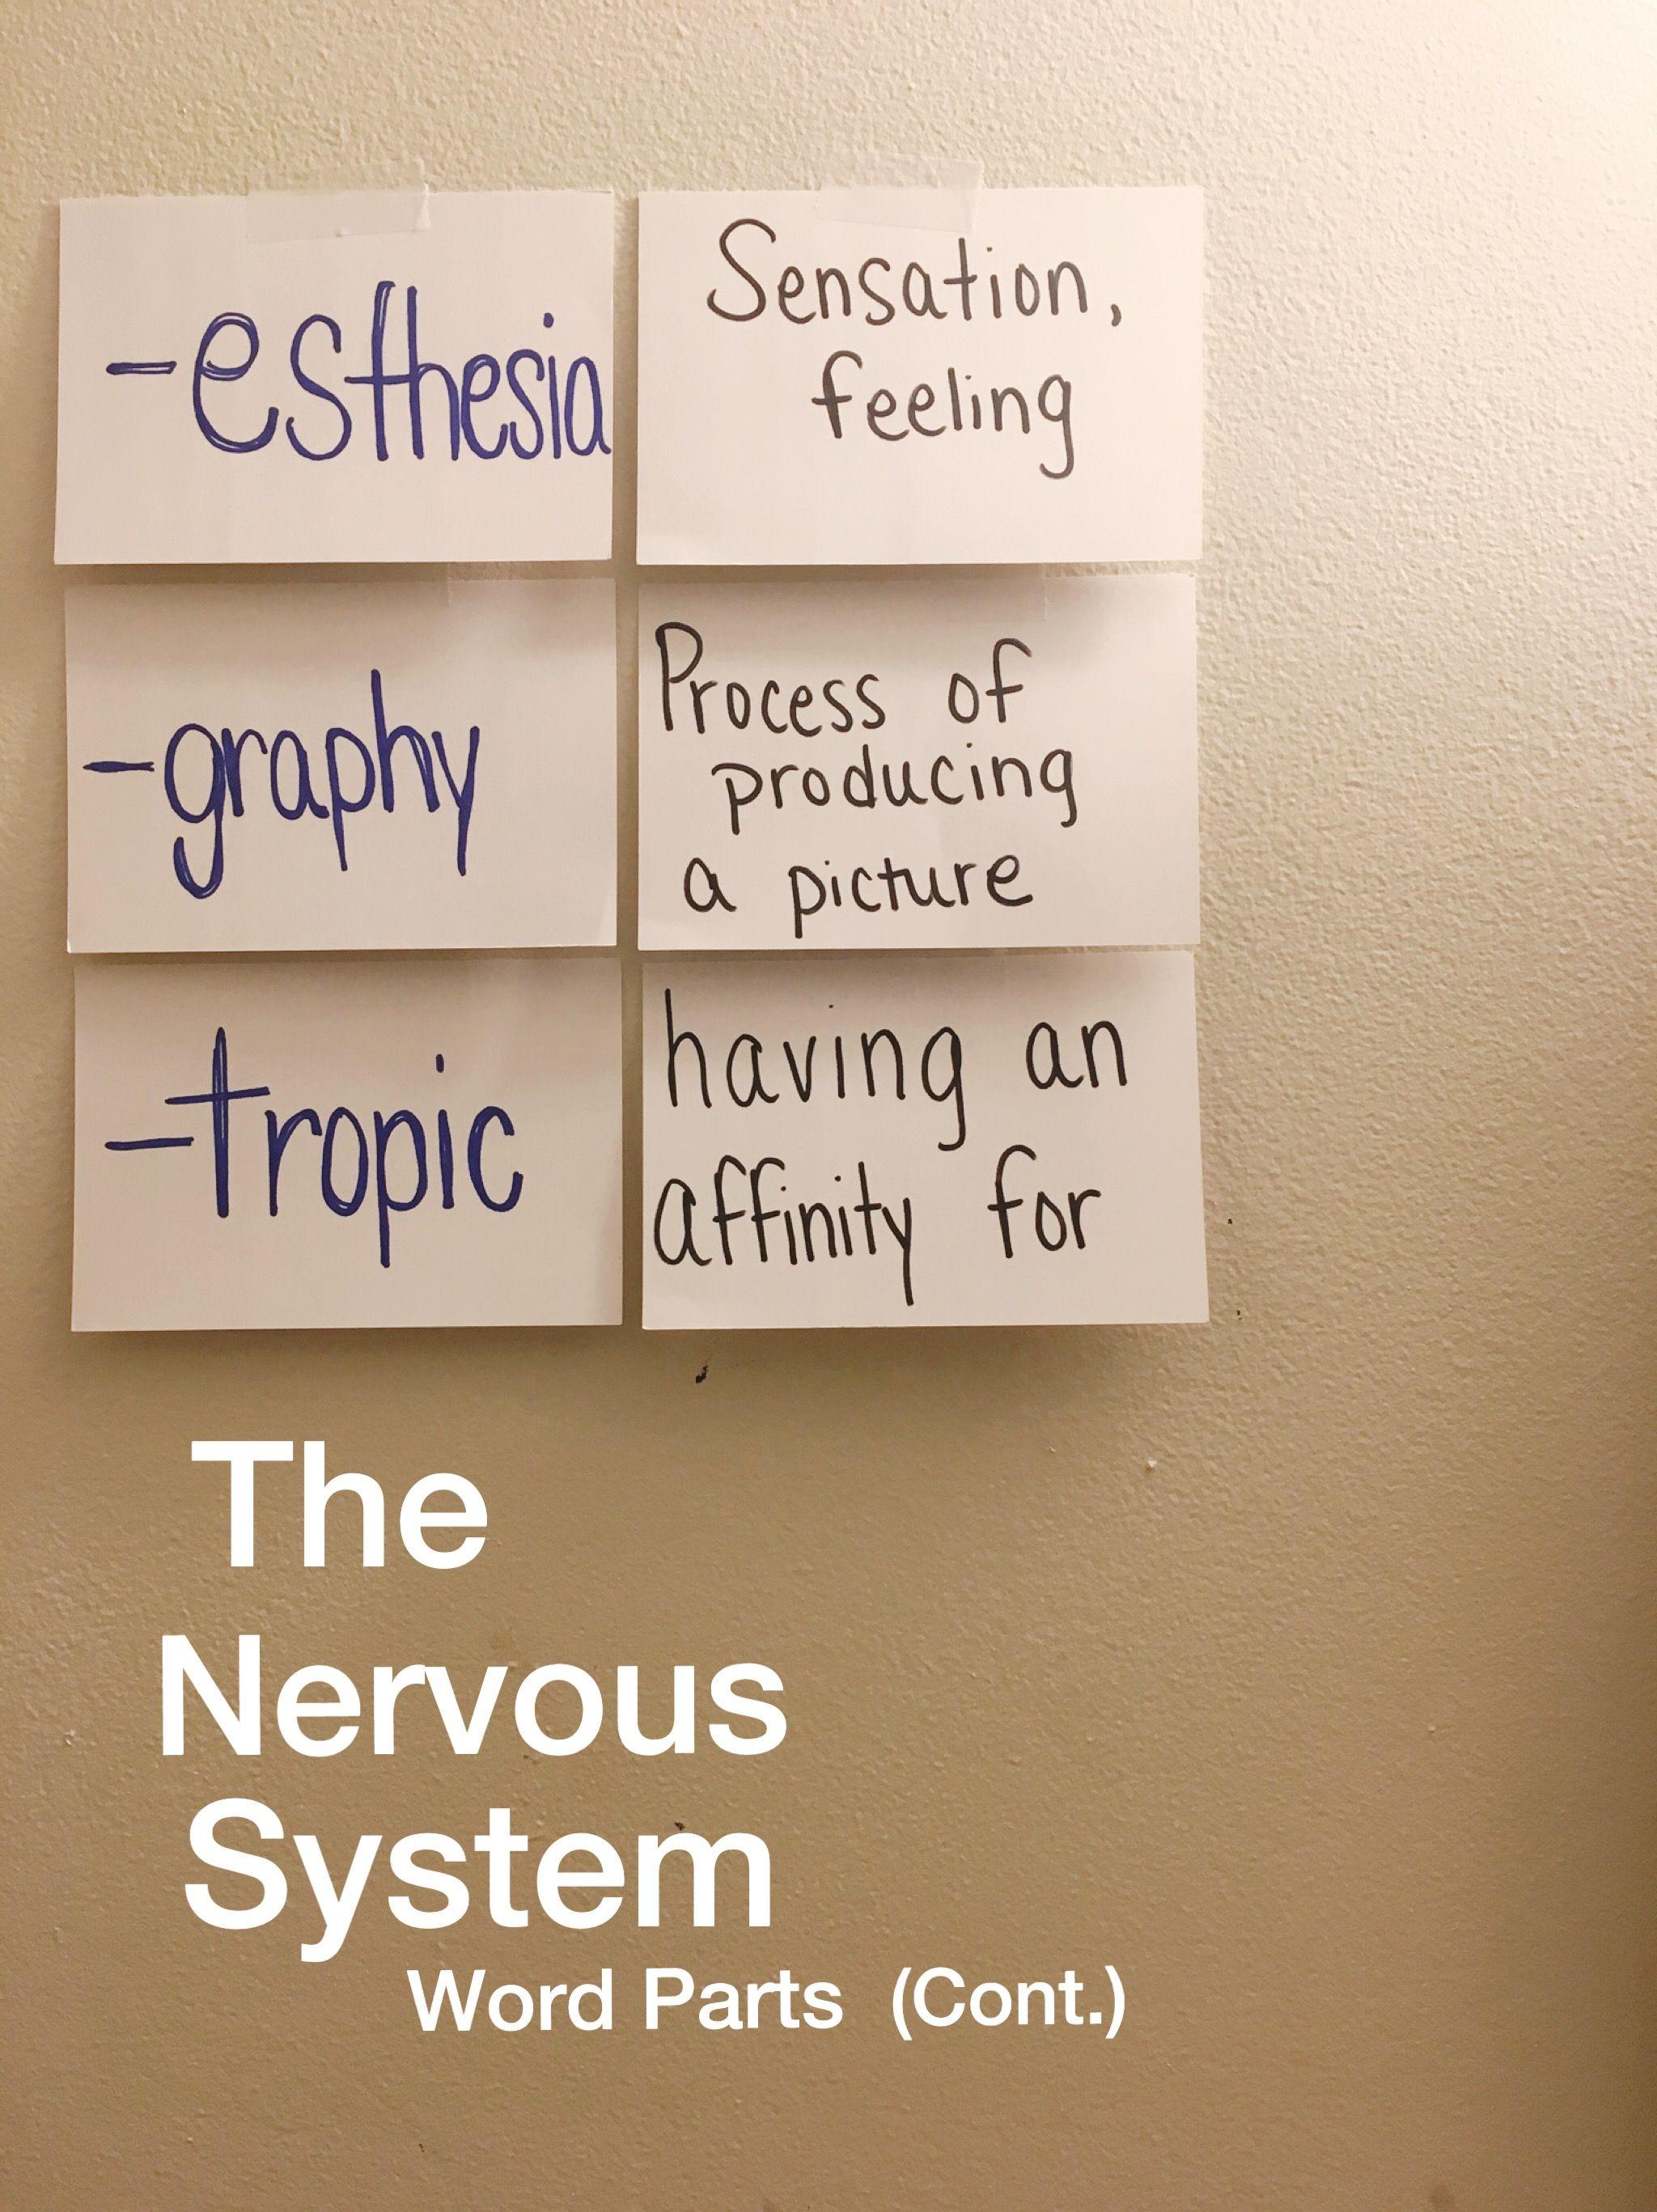 Nursing Notes. The Nervous System Word Parts, cont. | Nursing Notes ...